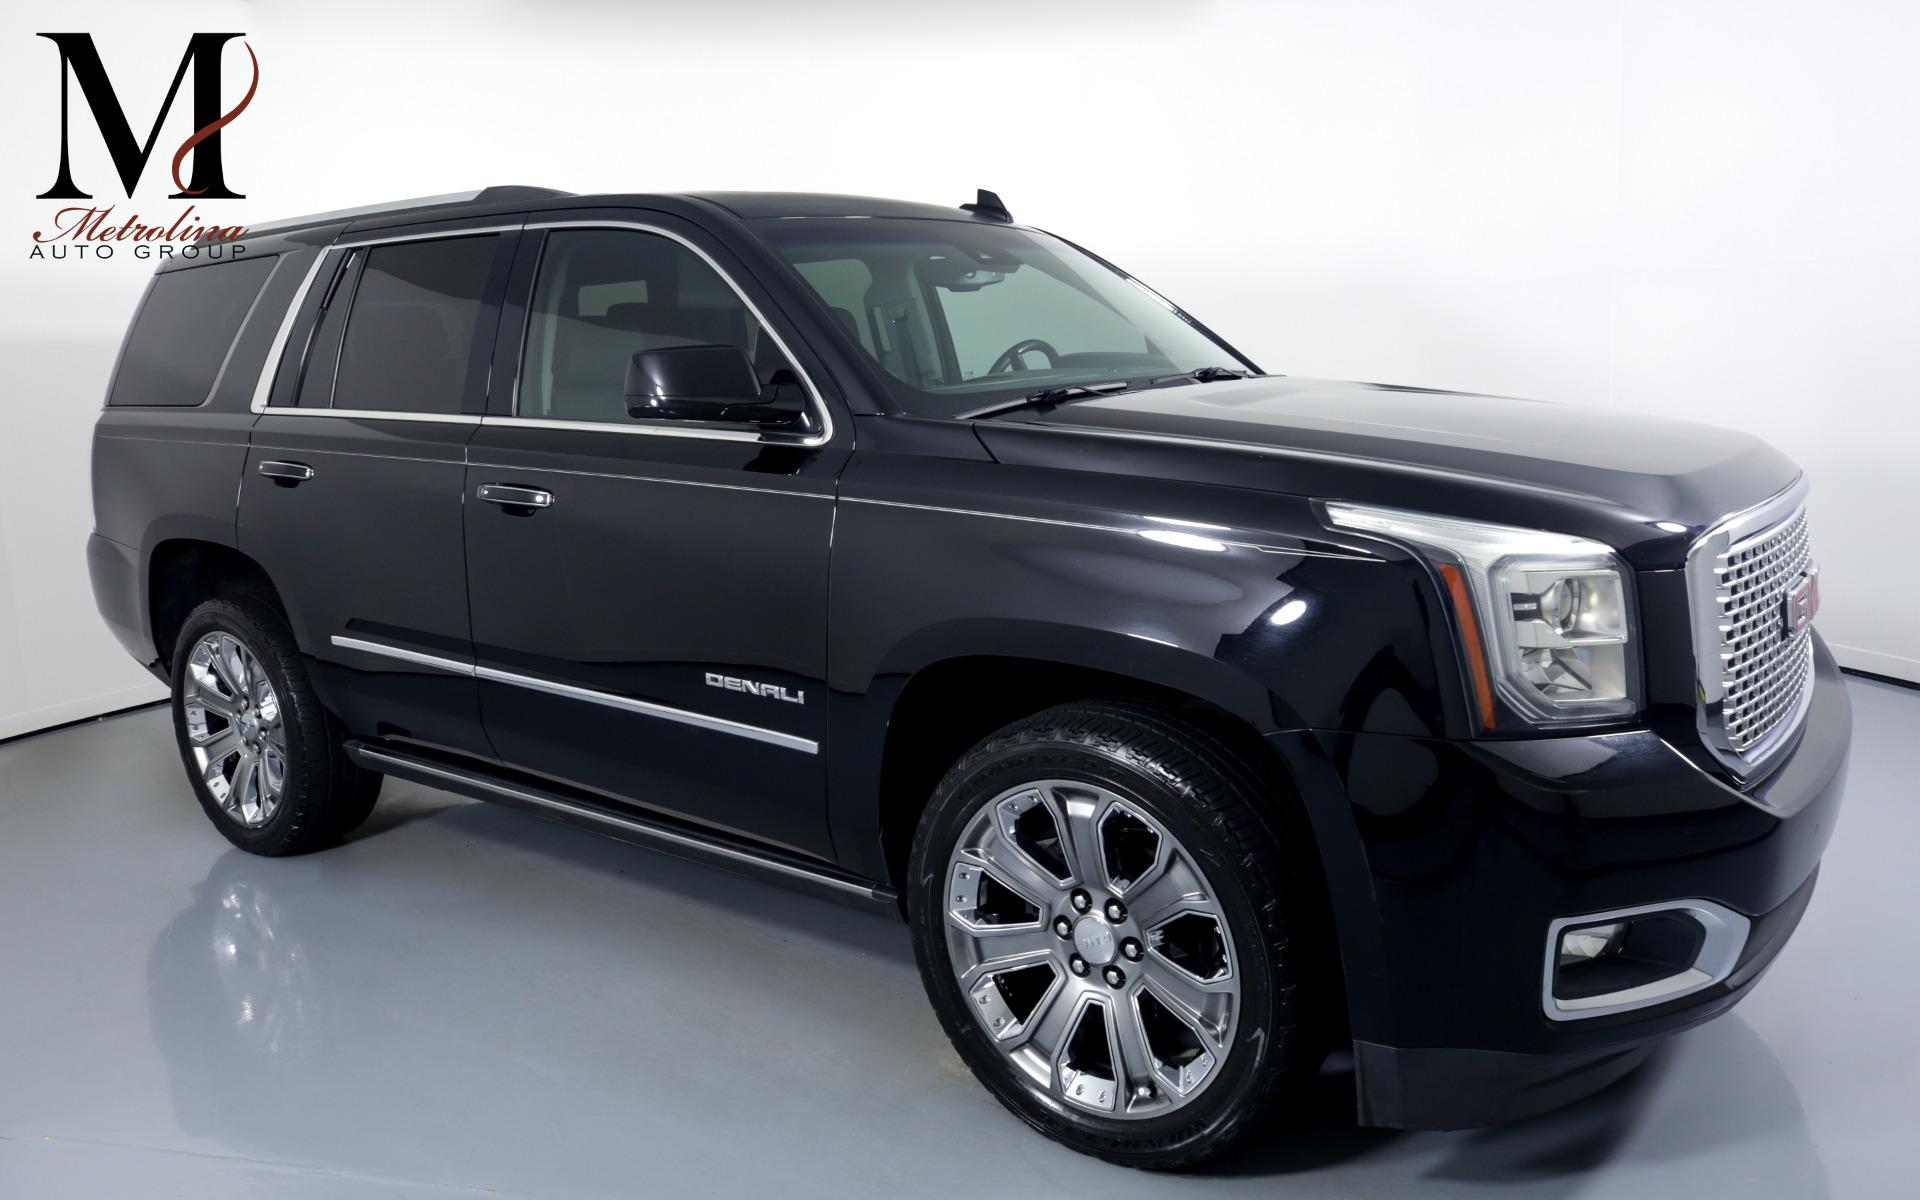 Used 2015 GMC Yukon Denali for sale $44,996 at Metrolina Auto Group in Charlotte NC 28217 - 1